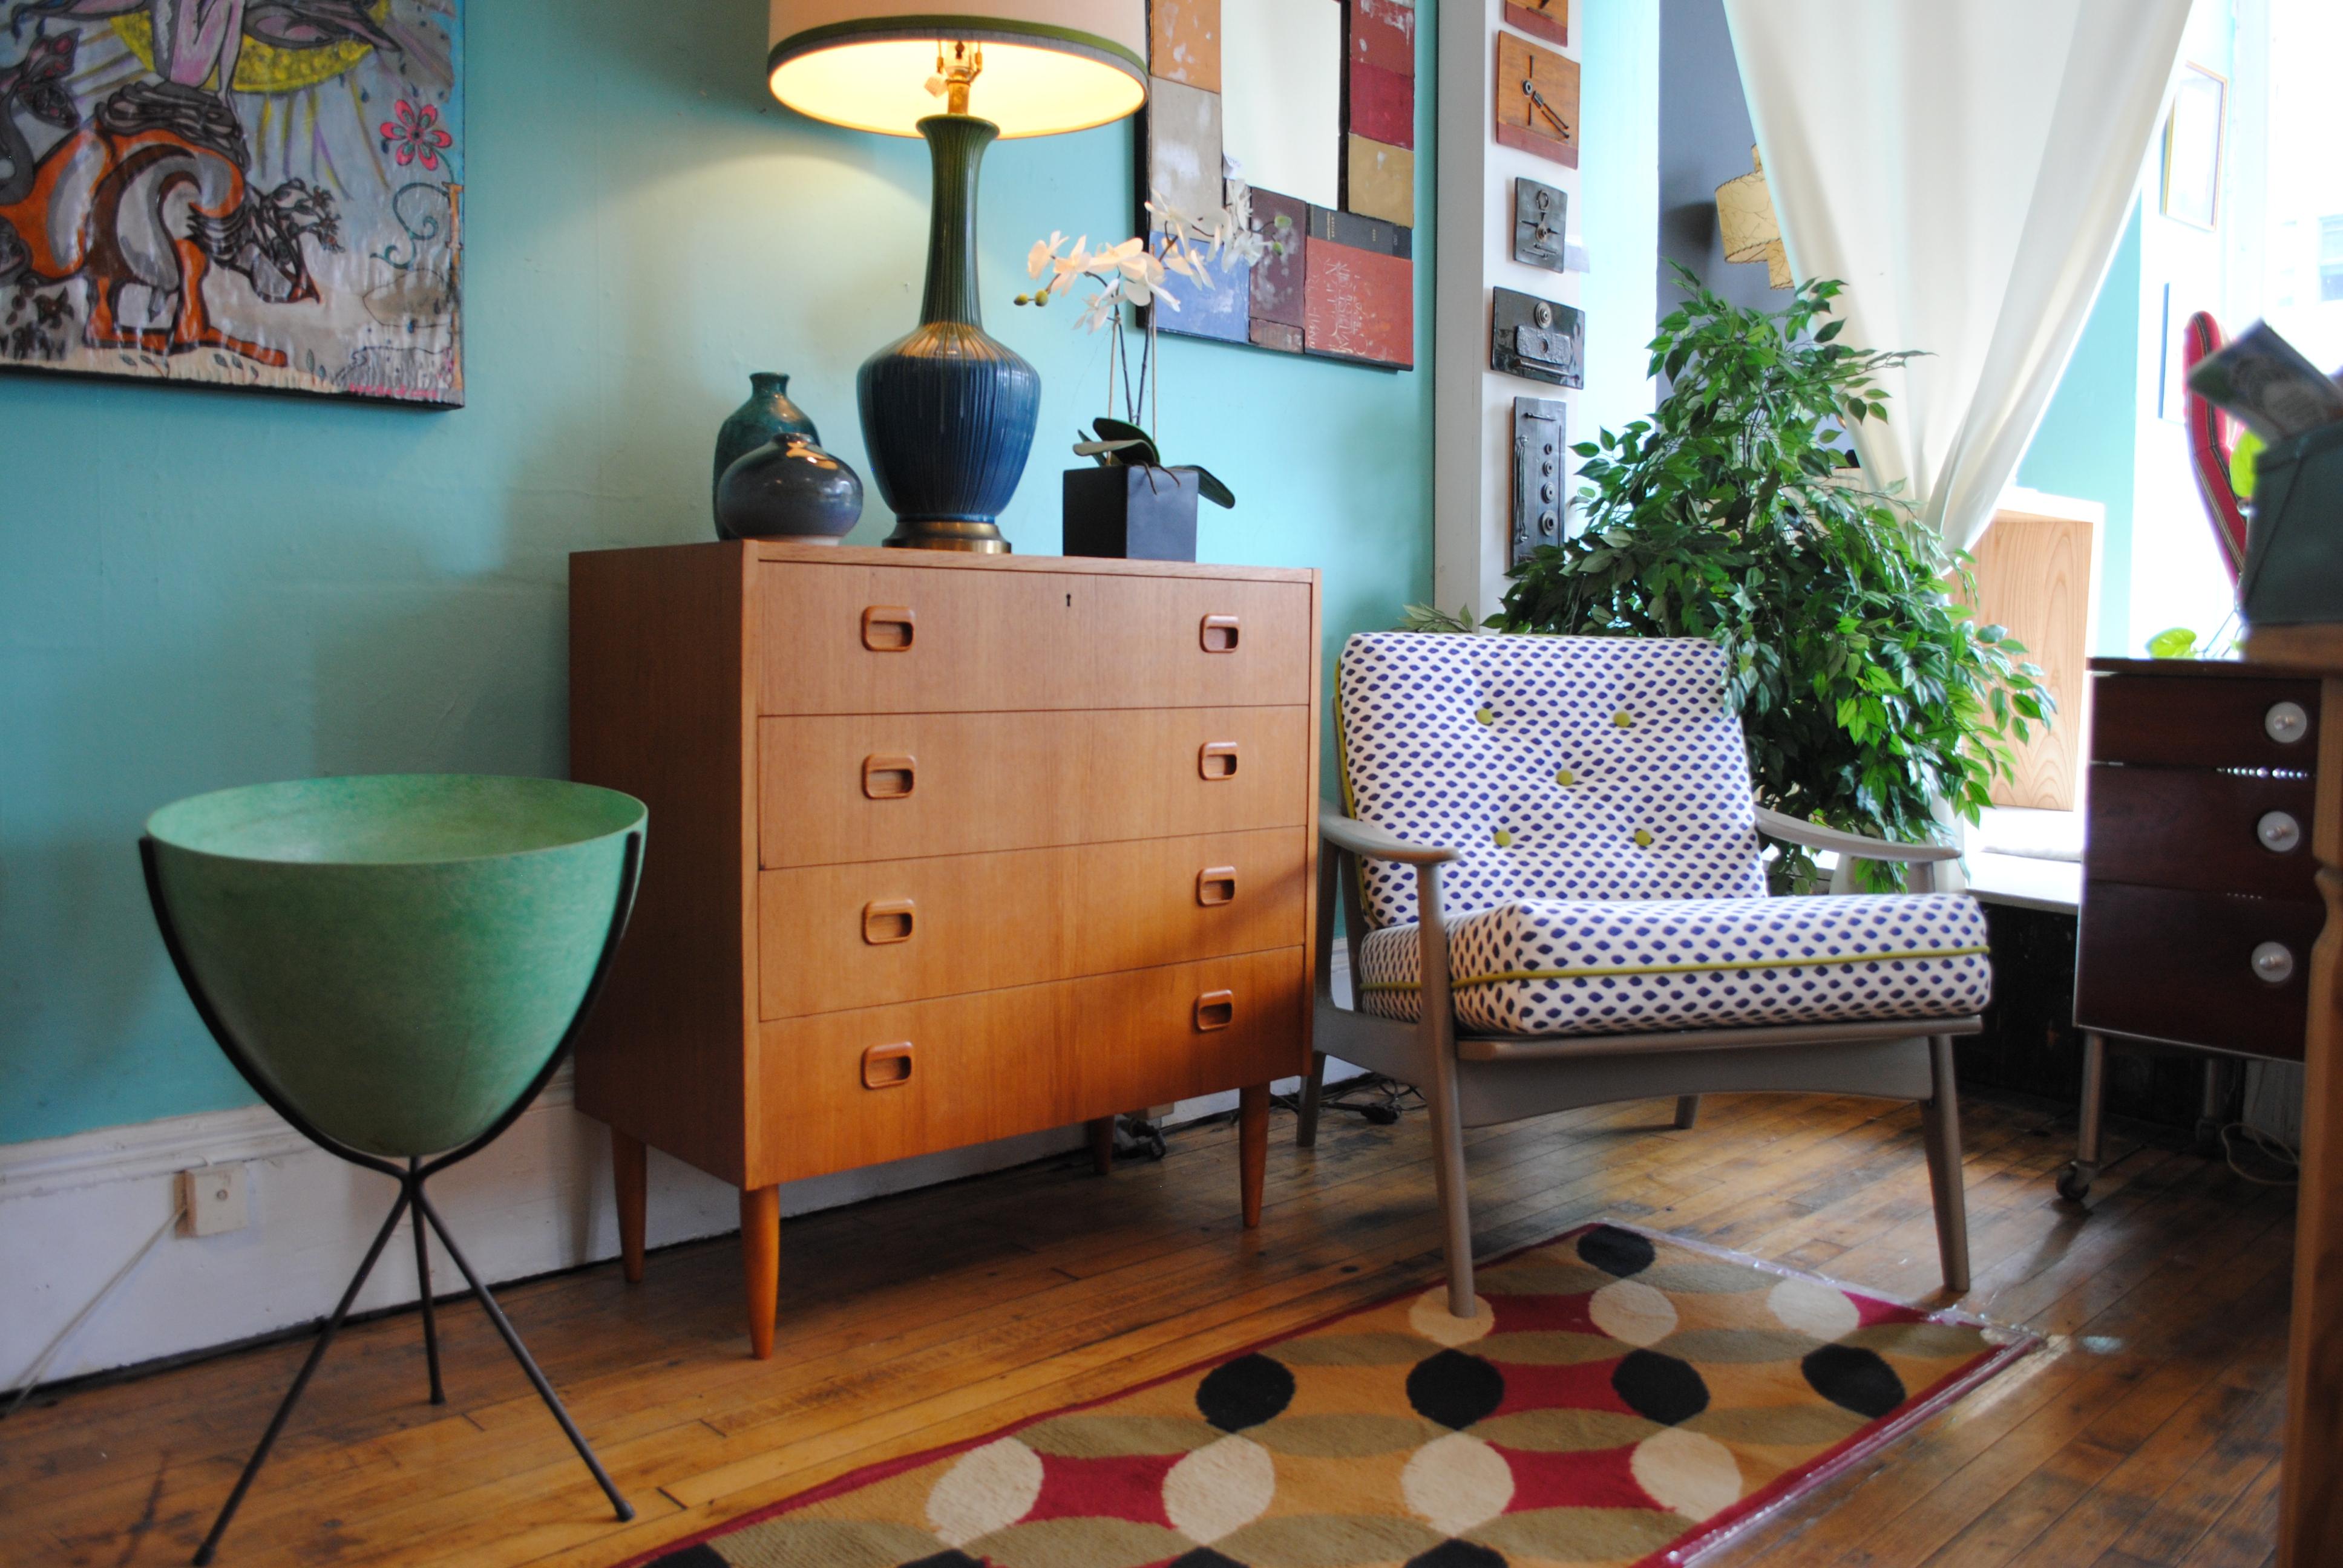 modern home furnishings) dsc. downtown pittsfield western massachusetts the berkshires  circa